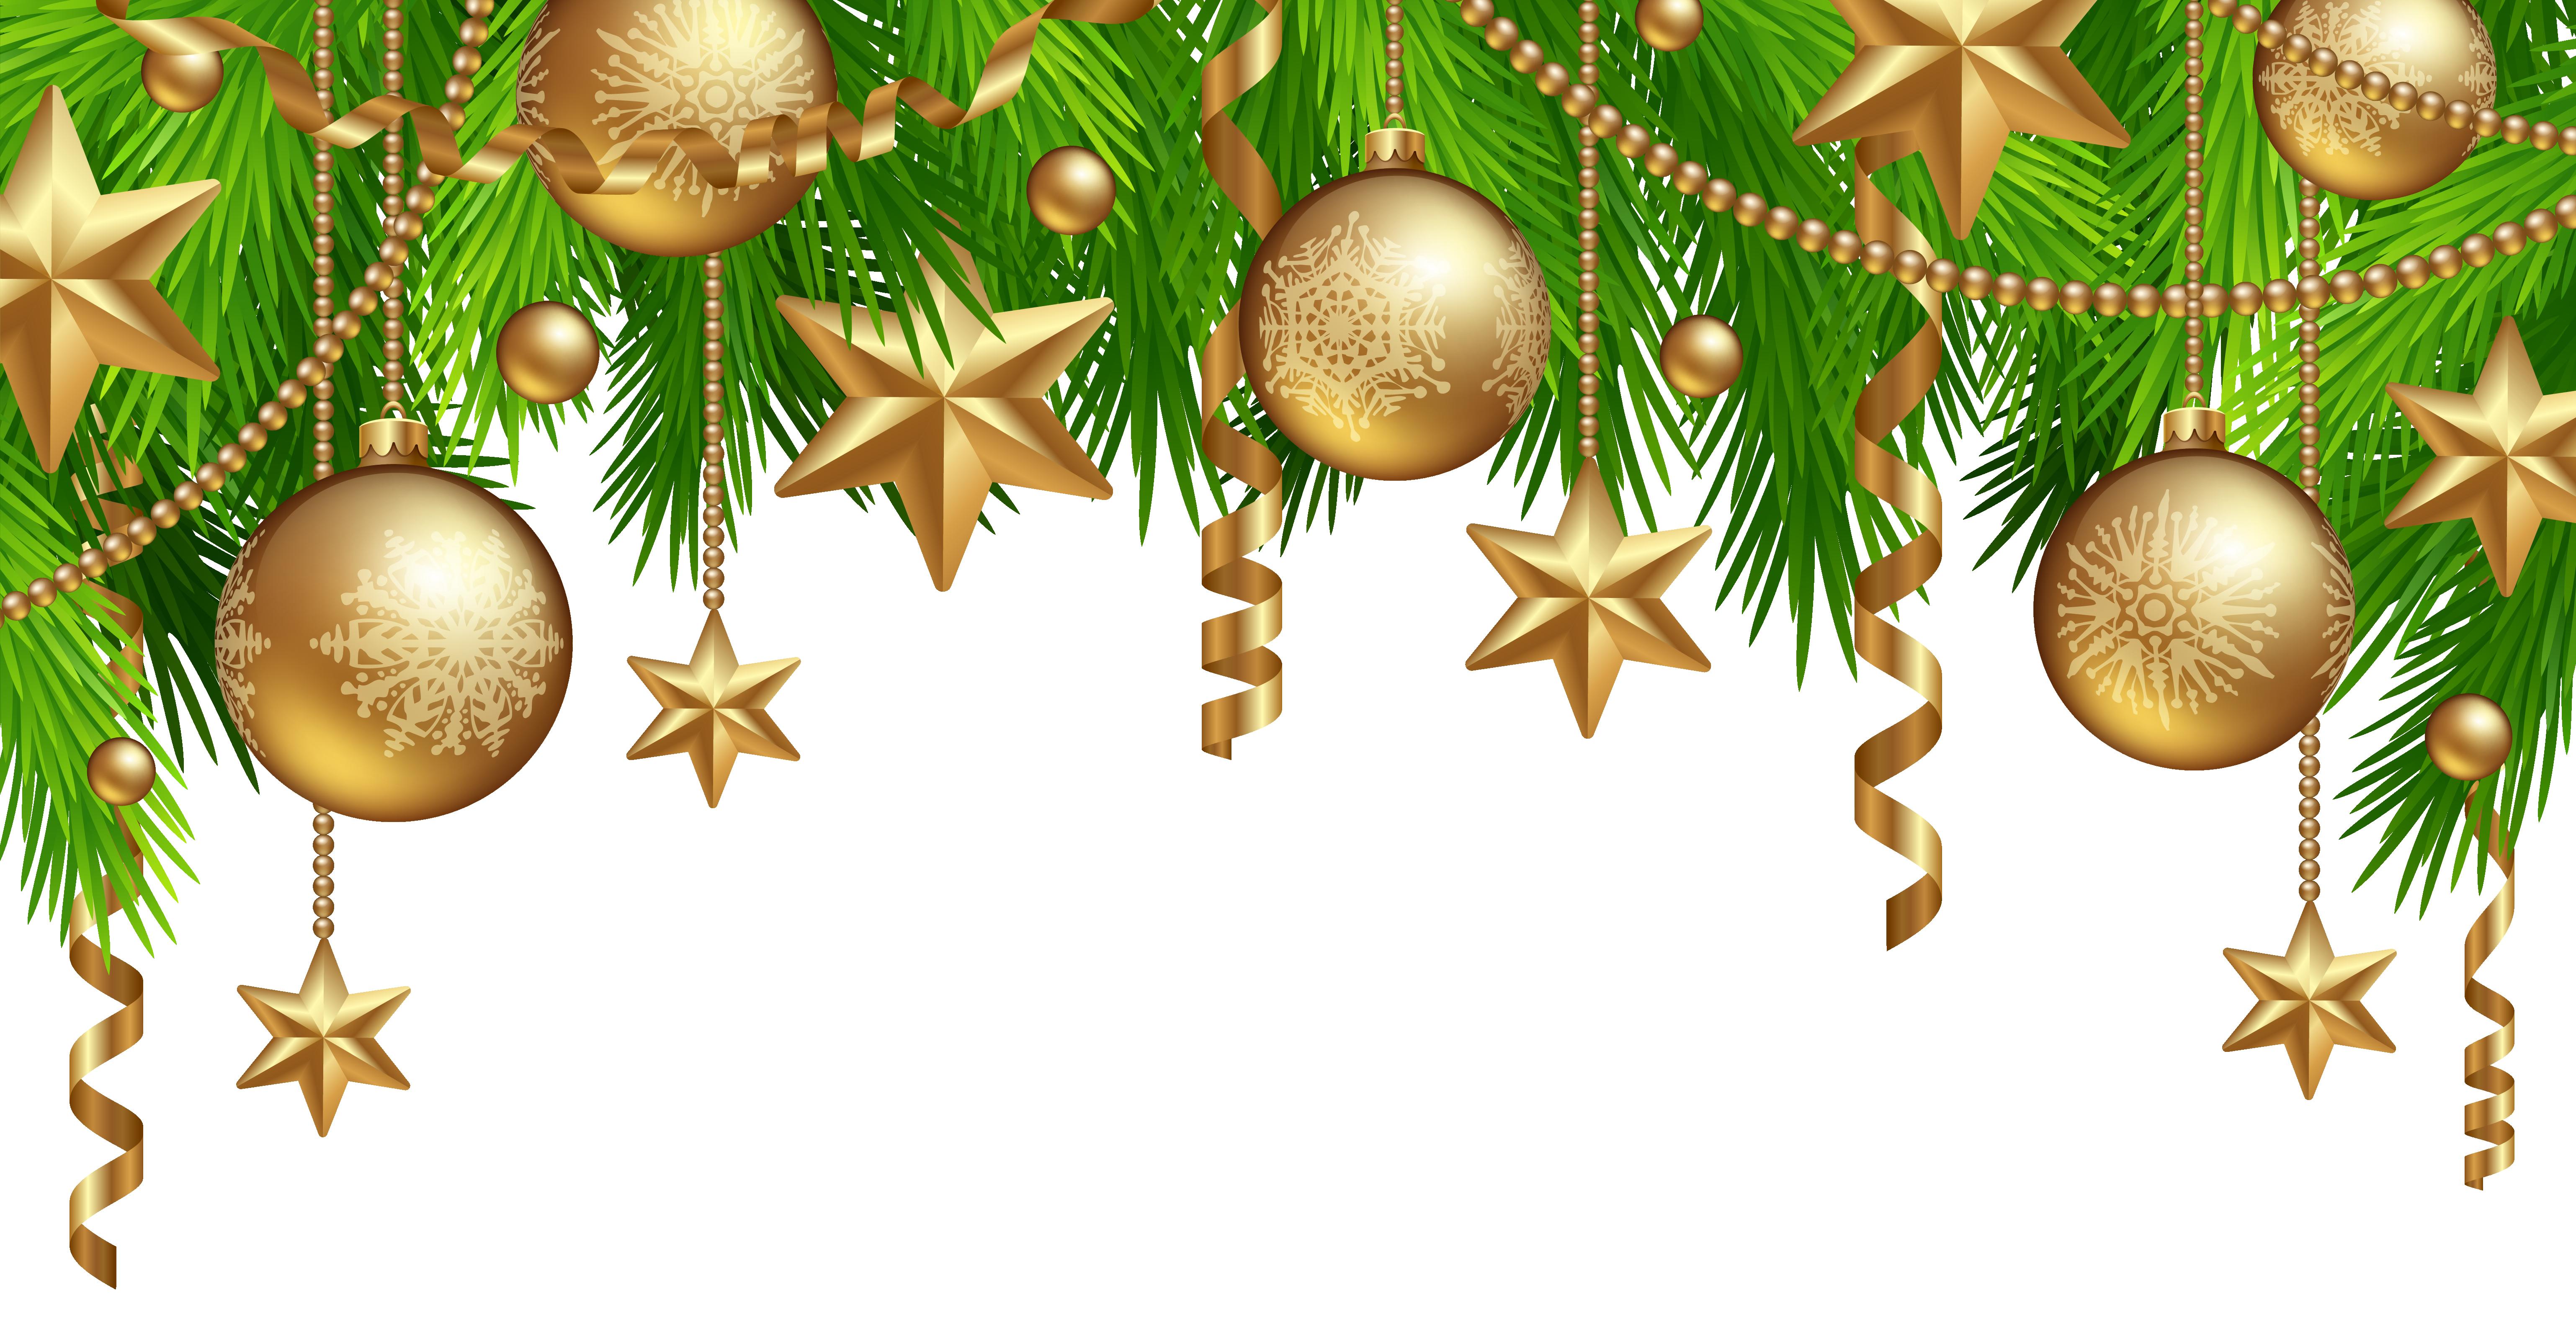 Christmas Border Decor PNG Clipart Image Boże narodzenie